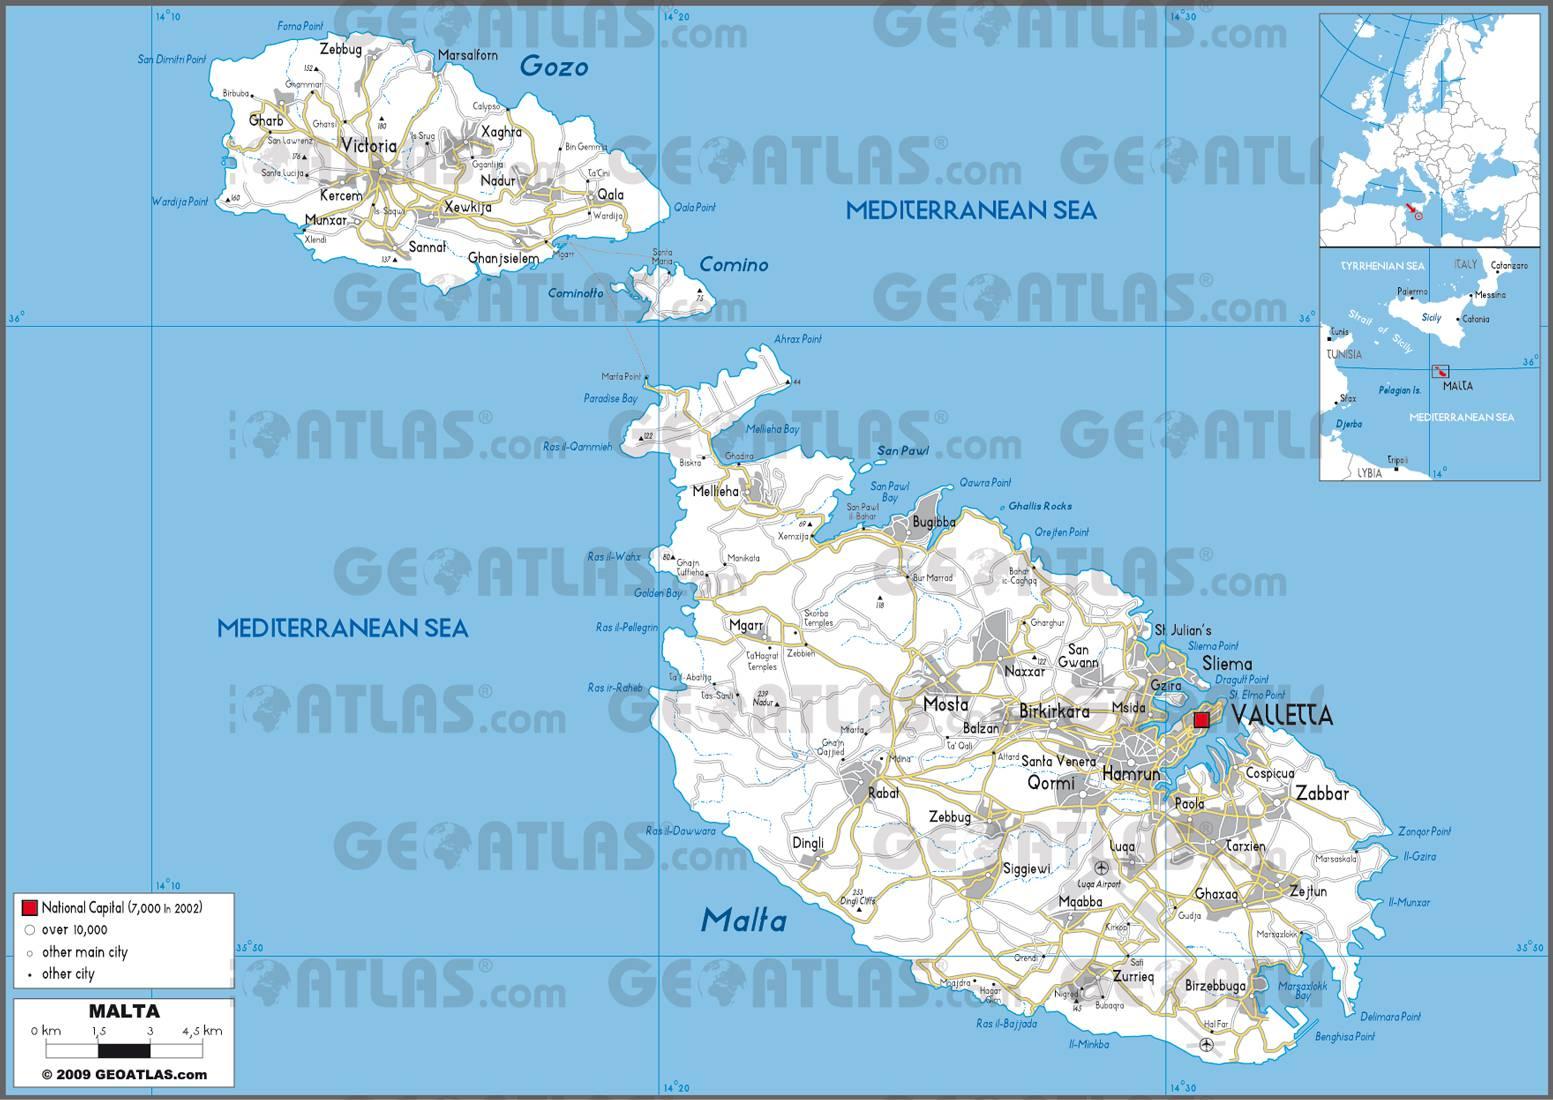 Carte de Malte - Plusieurs carte de l'île dans la méditérranée